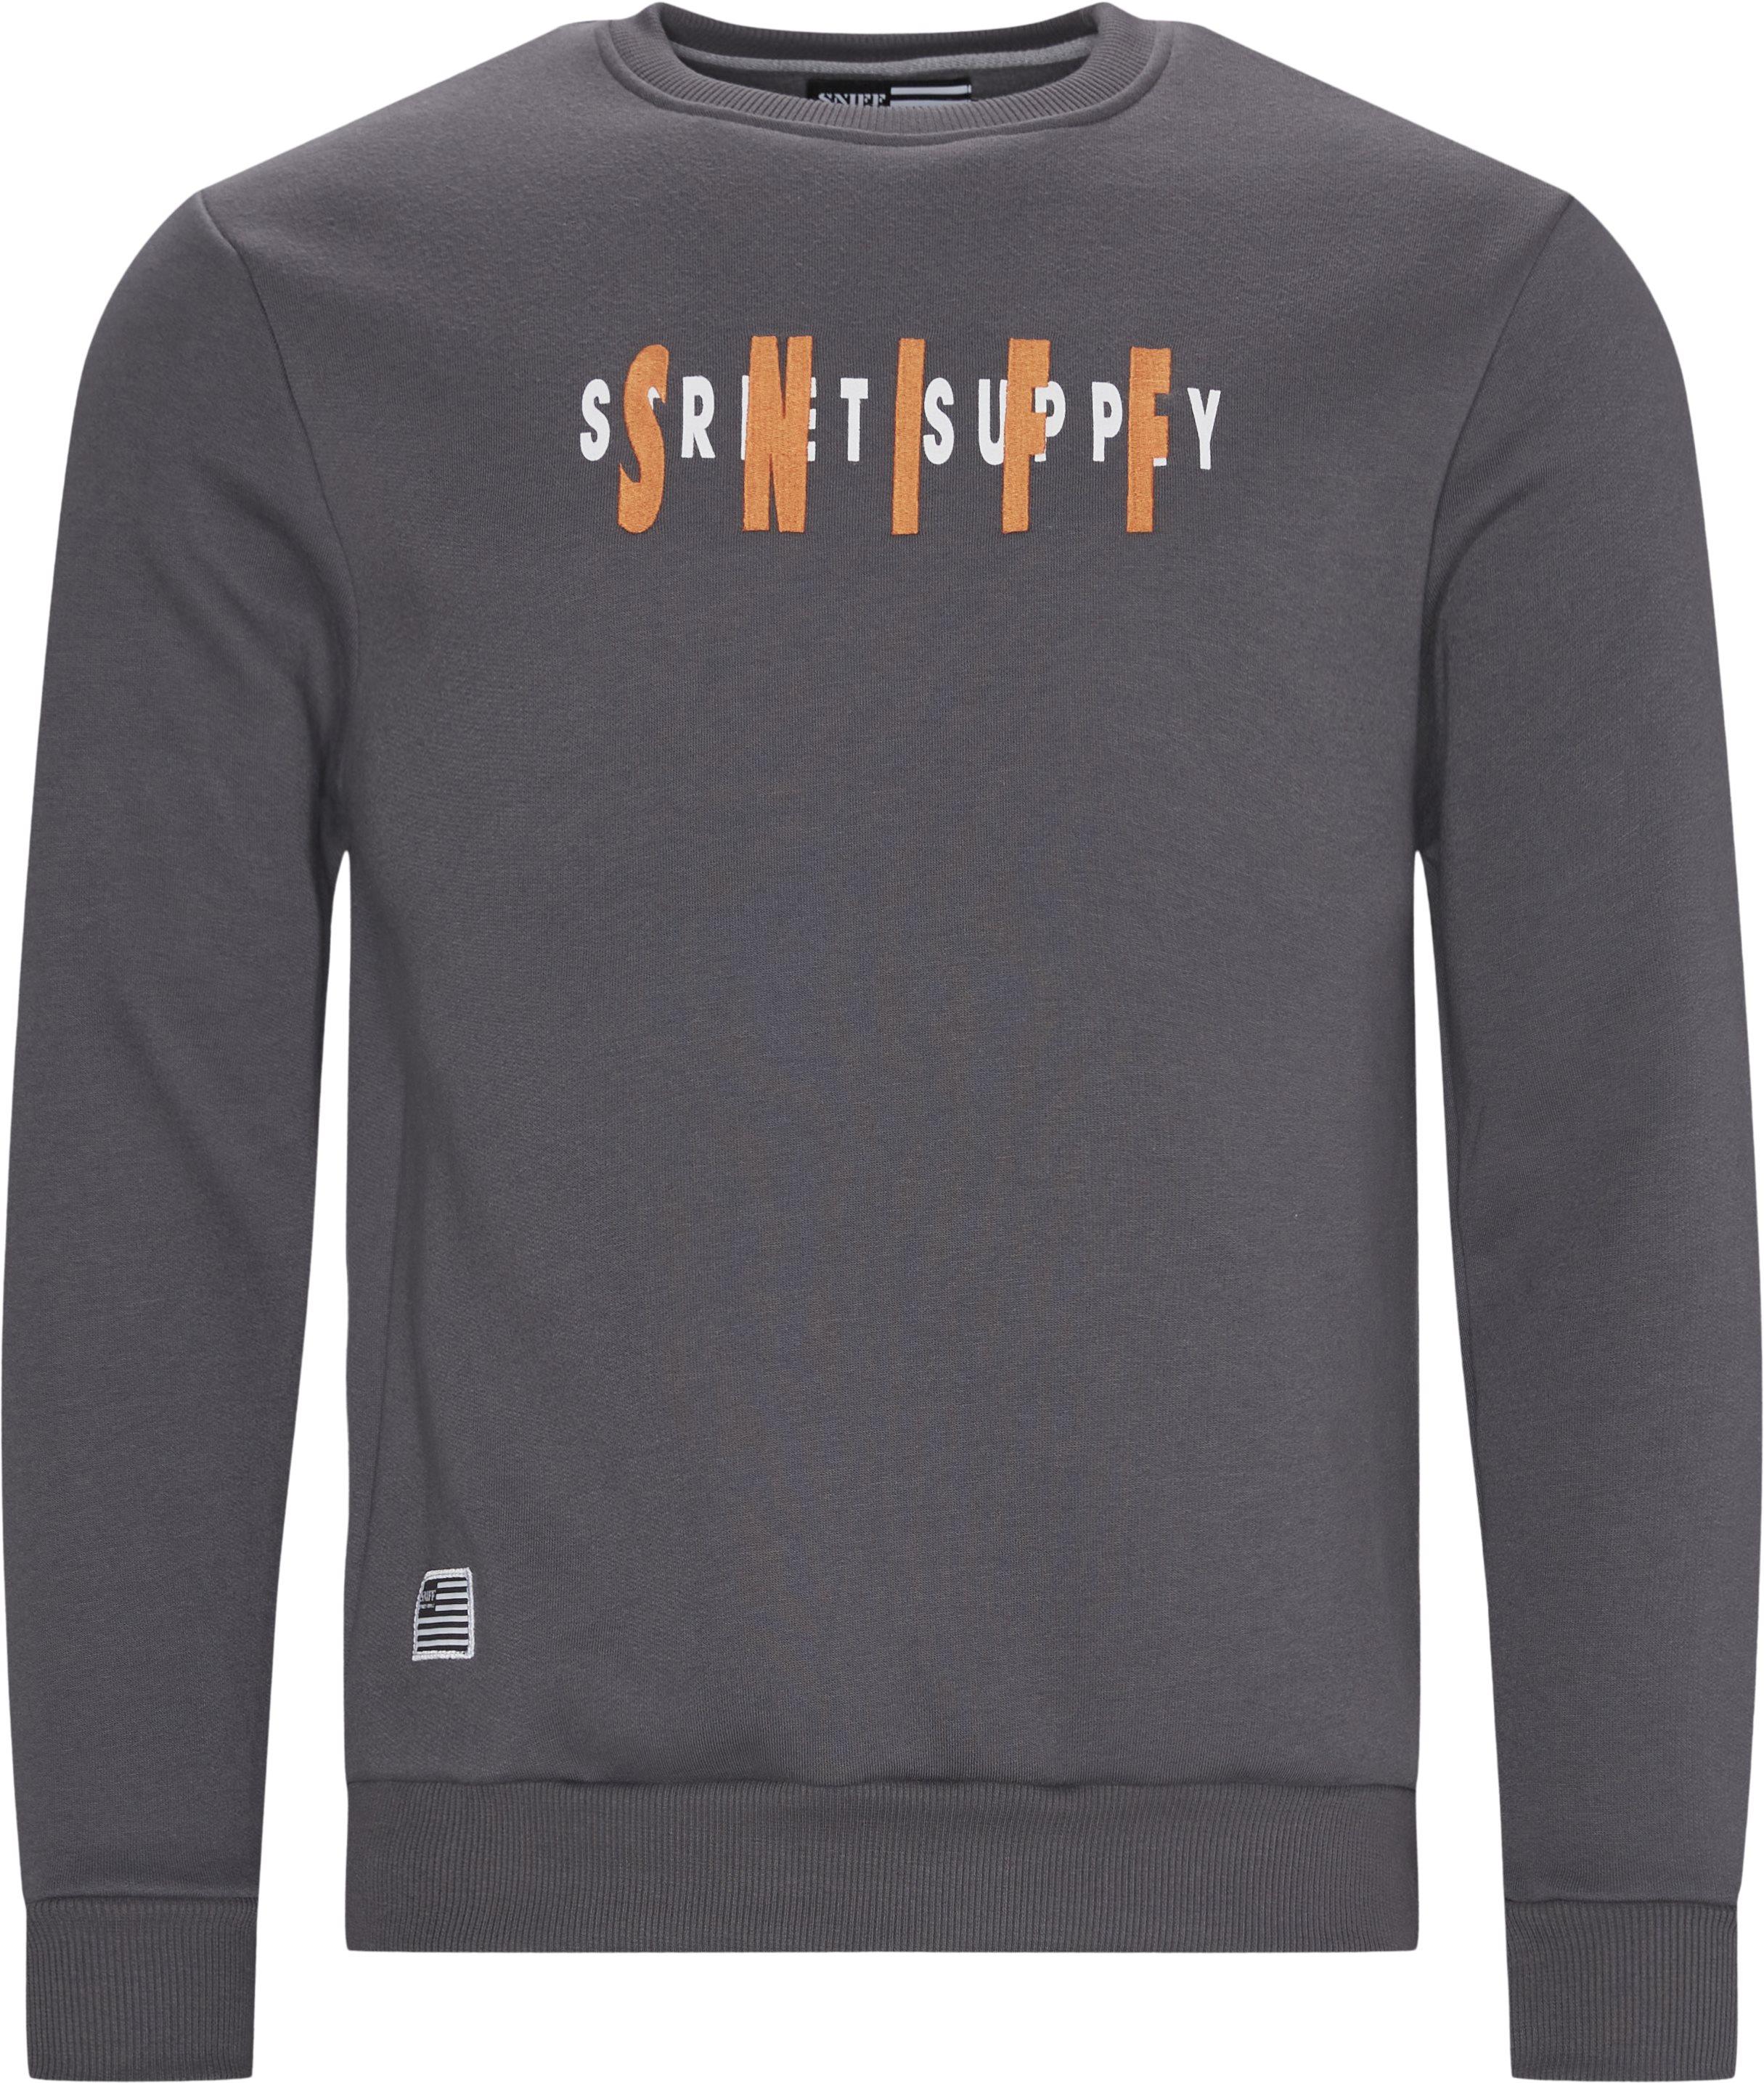 Biden Crewneck Sweatshirt - Sweatshirts - Regular - Grå